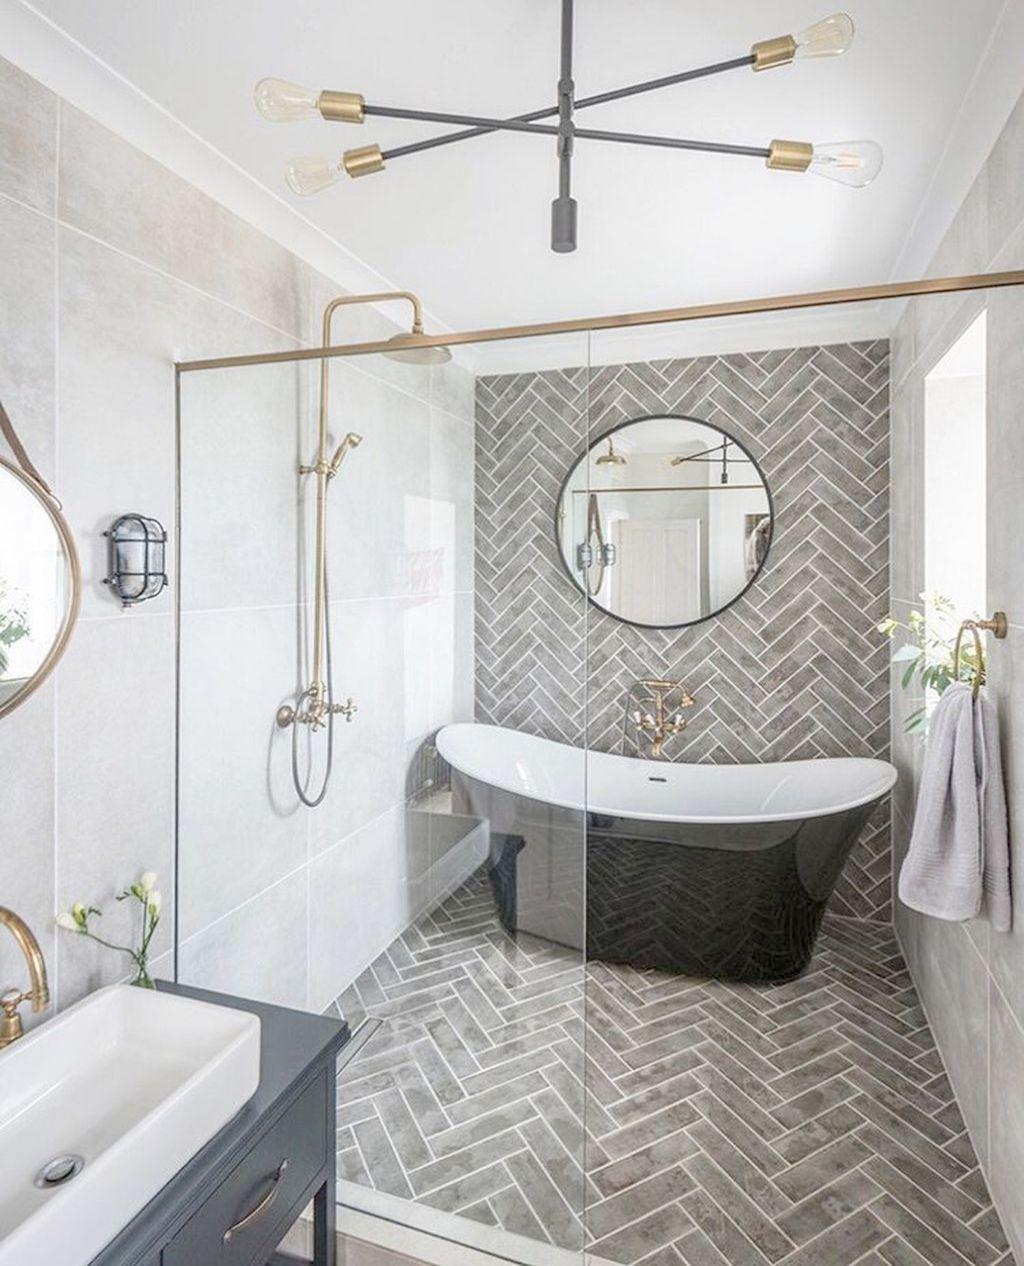 Bathroom Ideas Half Bath Best Bathroom Tile Ideas 2019 Bathroom Ideas Earth Tones Oppos Master Bathroom Design Modern Master Bathroom Bathroom Remodel Master